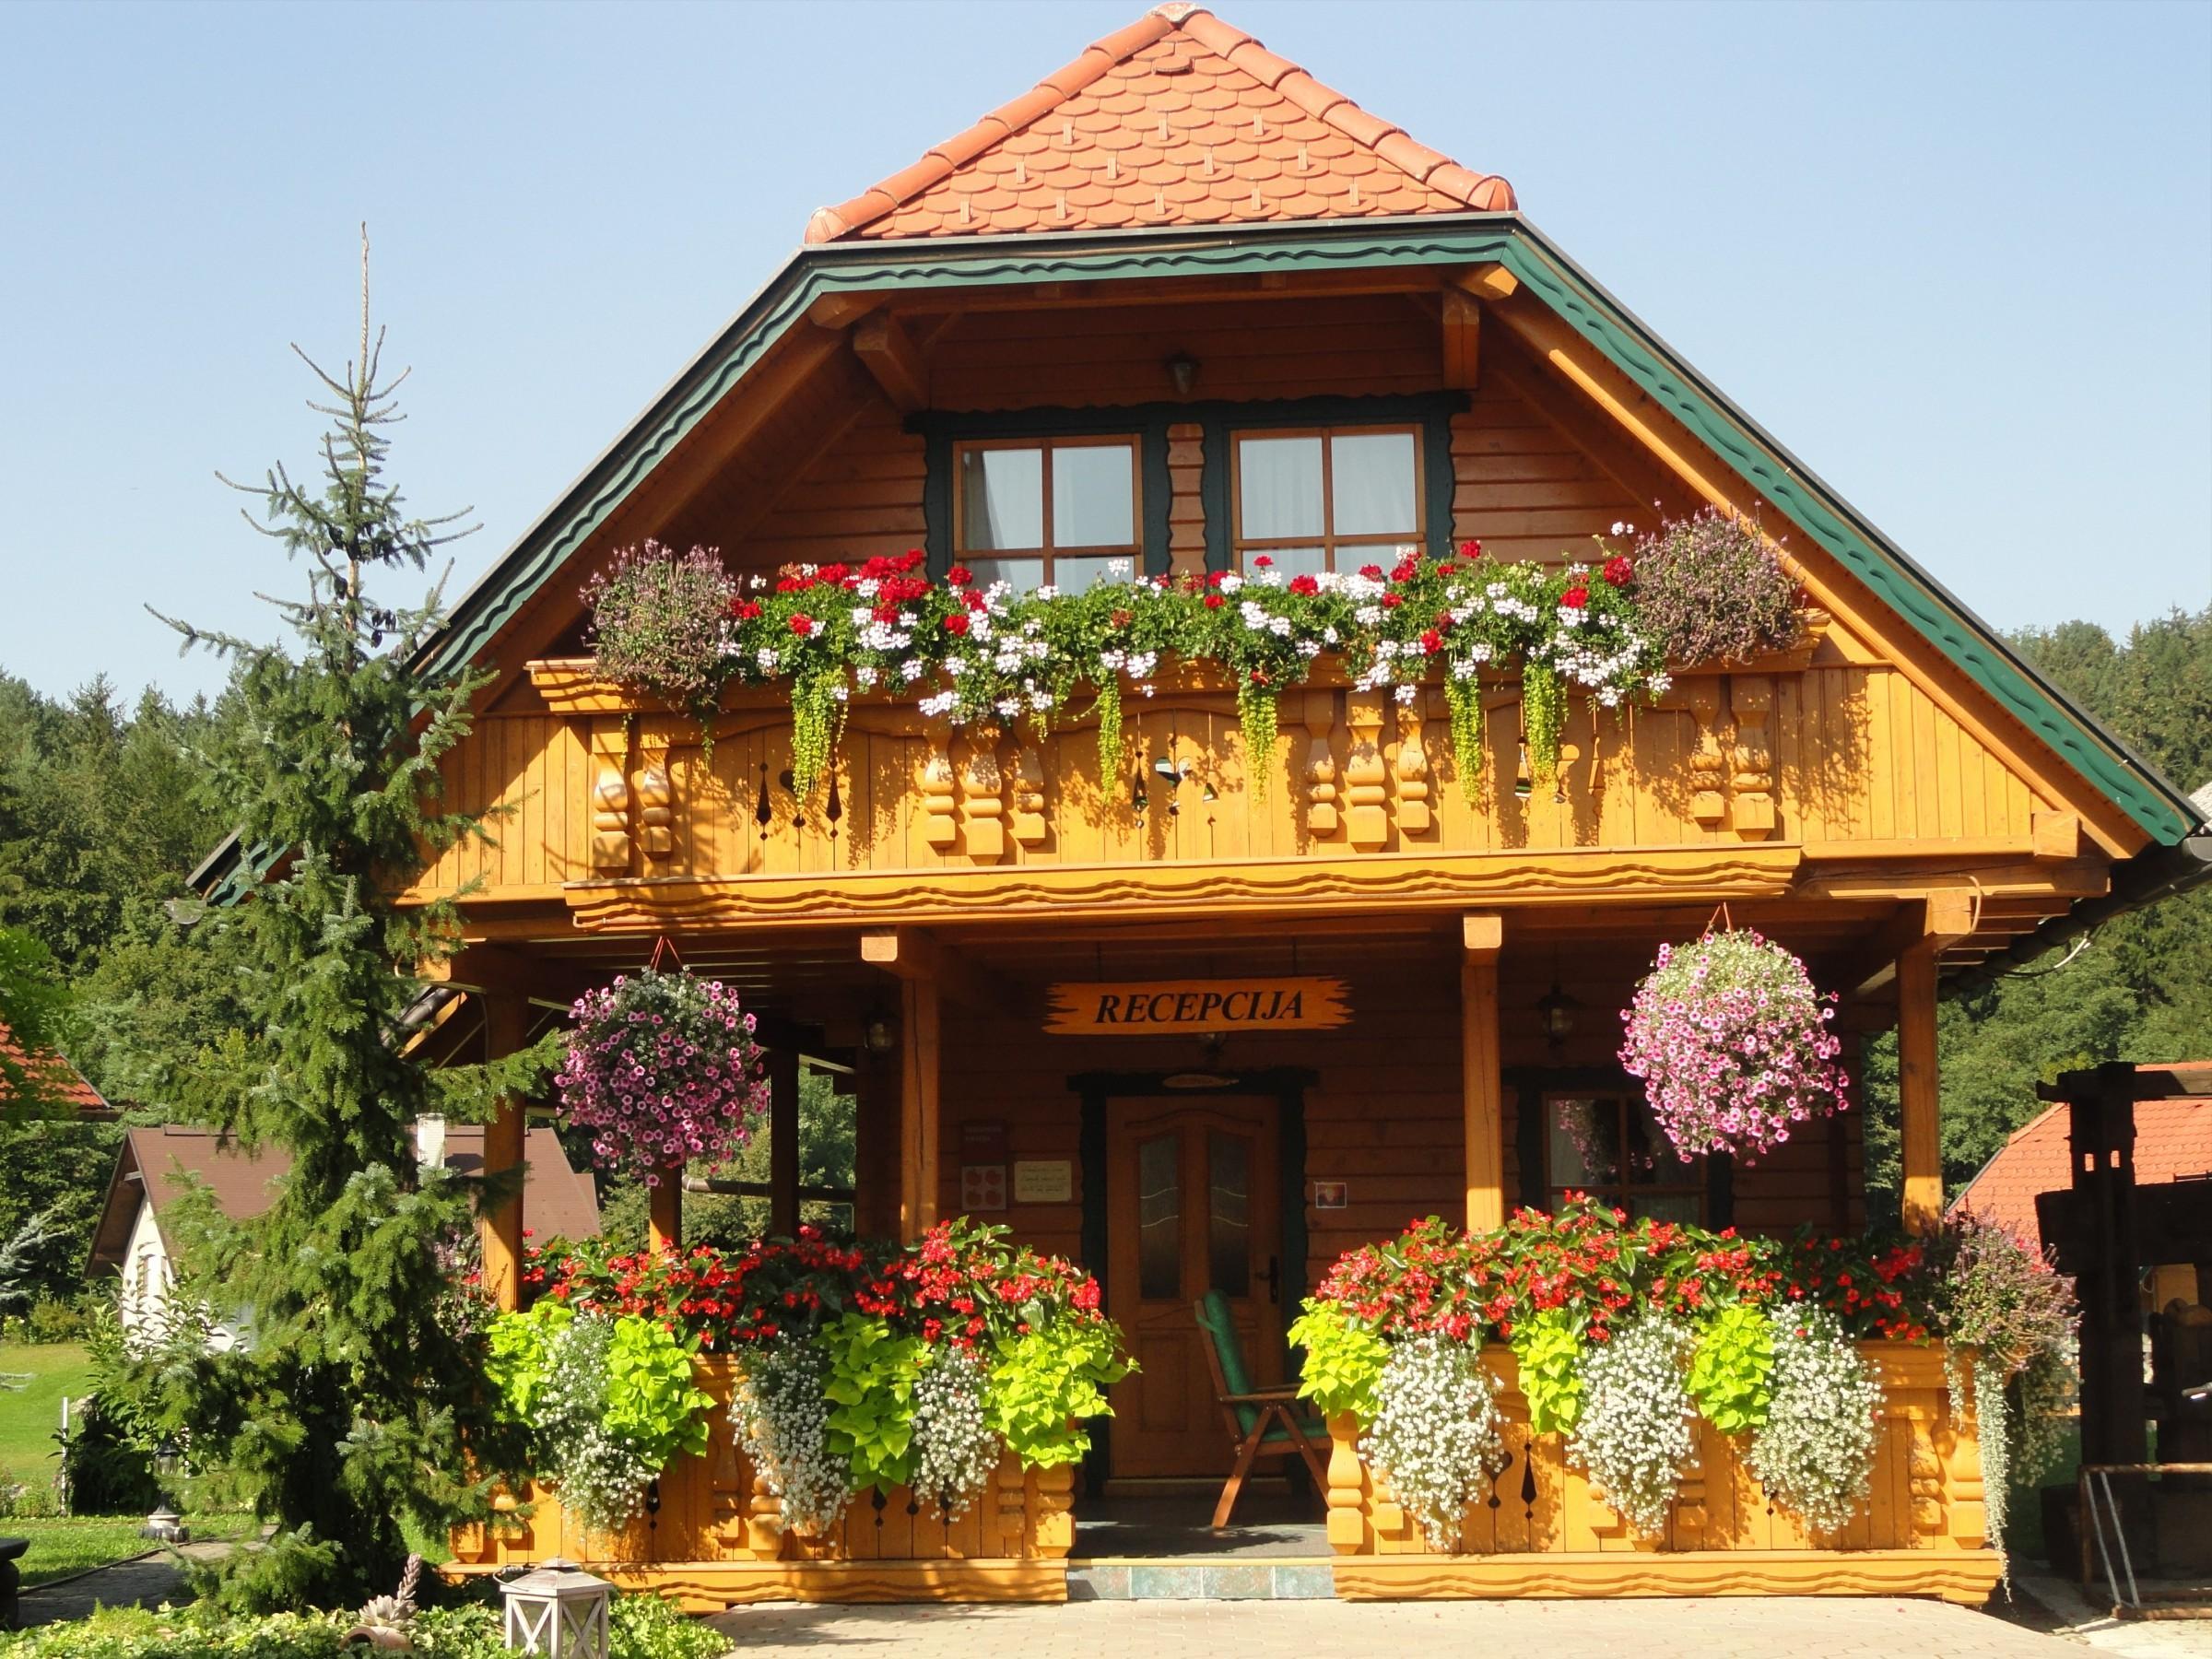 A.Koroτec-recepcija, zeleni apartma, foto arhiv Koroτec, Savinjska dolina